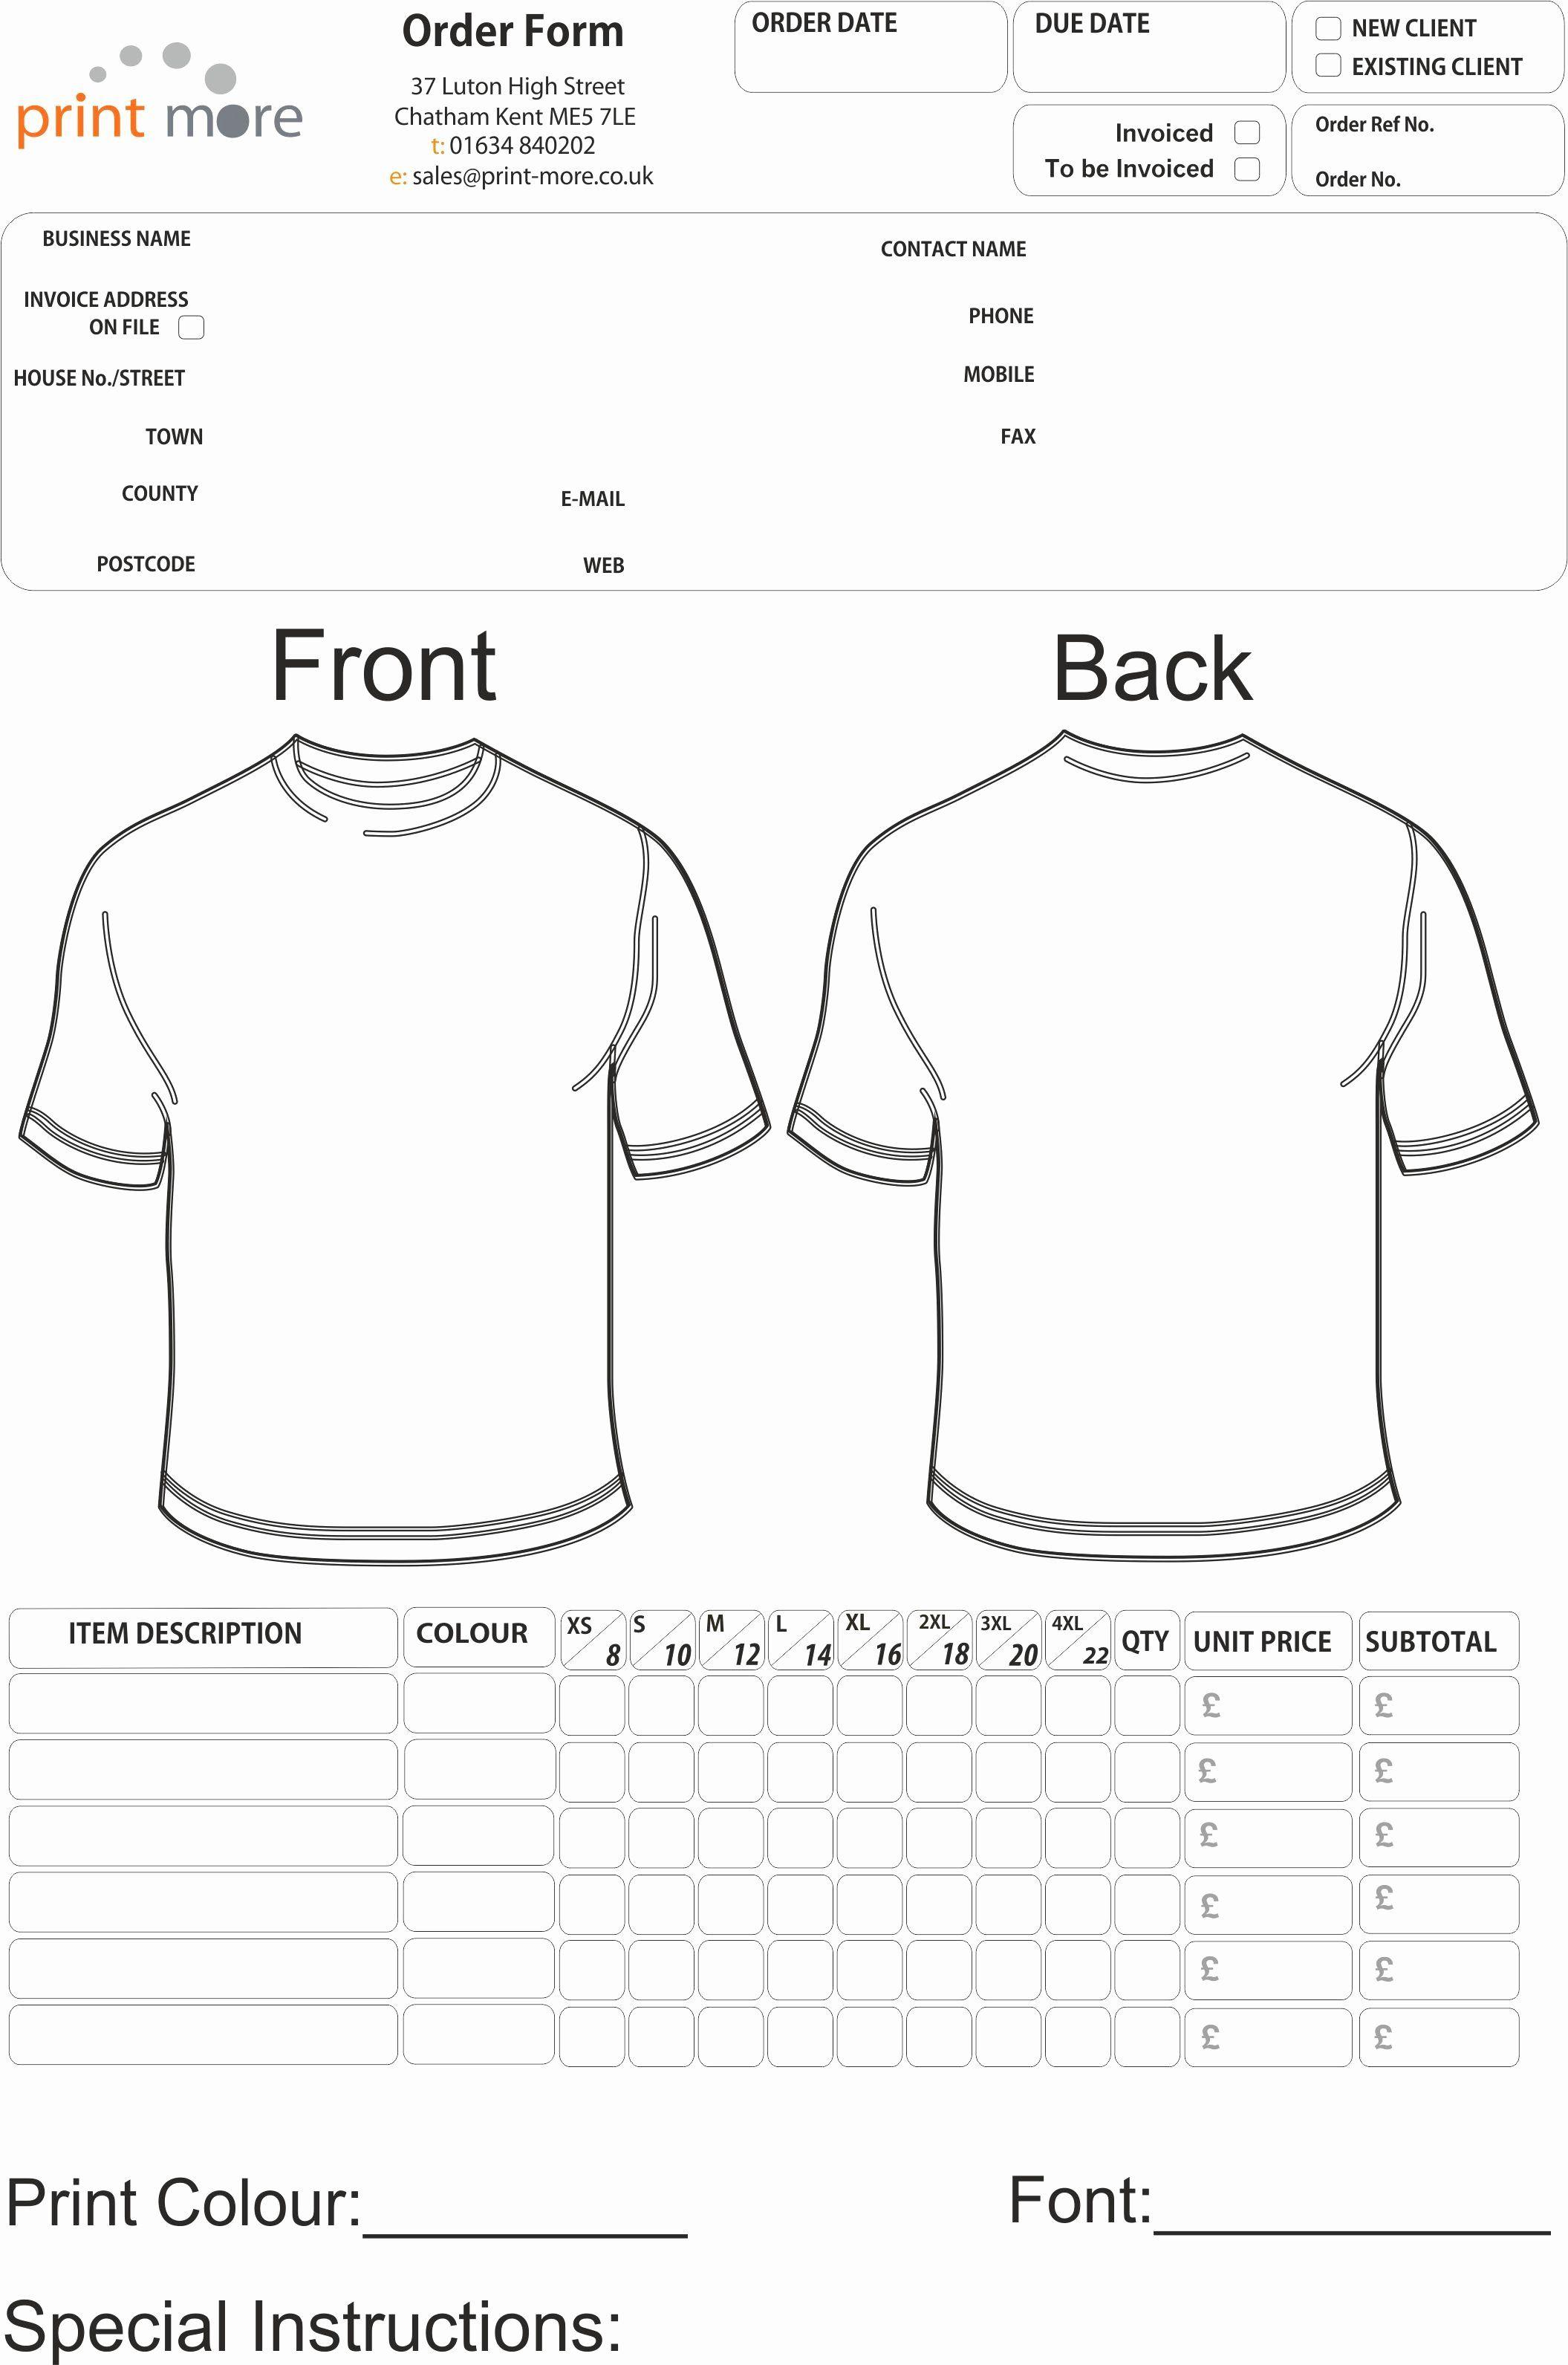 Pre Order Form Template Lovely T Shirt Order Form Template Order Form Template Free Order Form Template Shirt Template